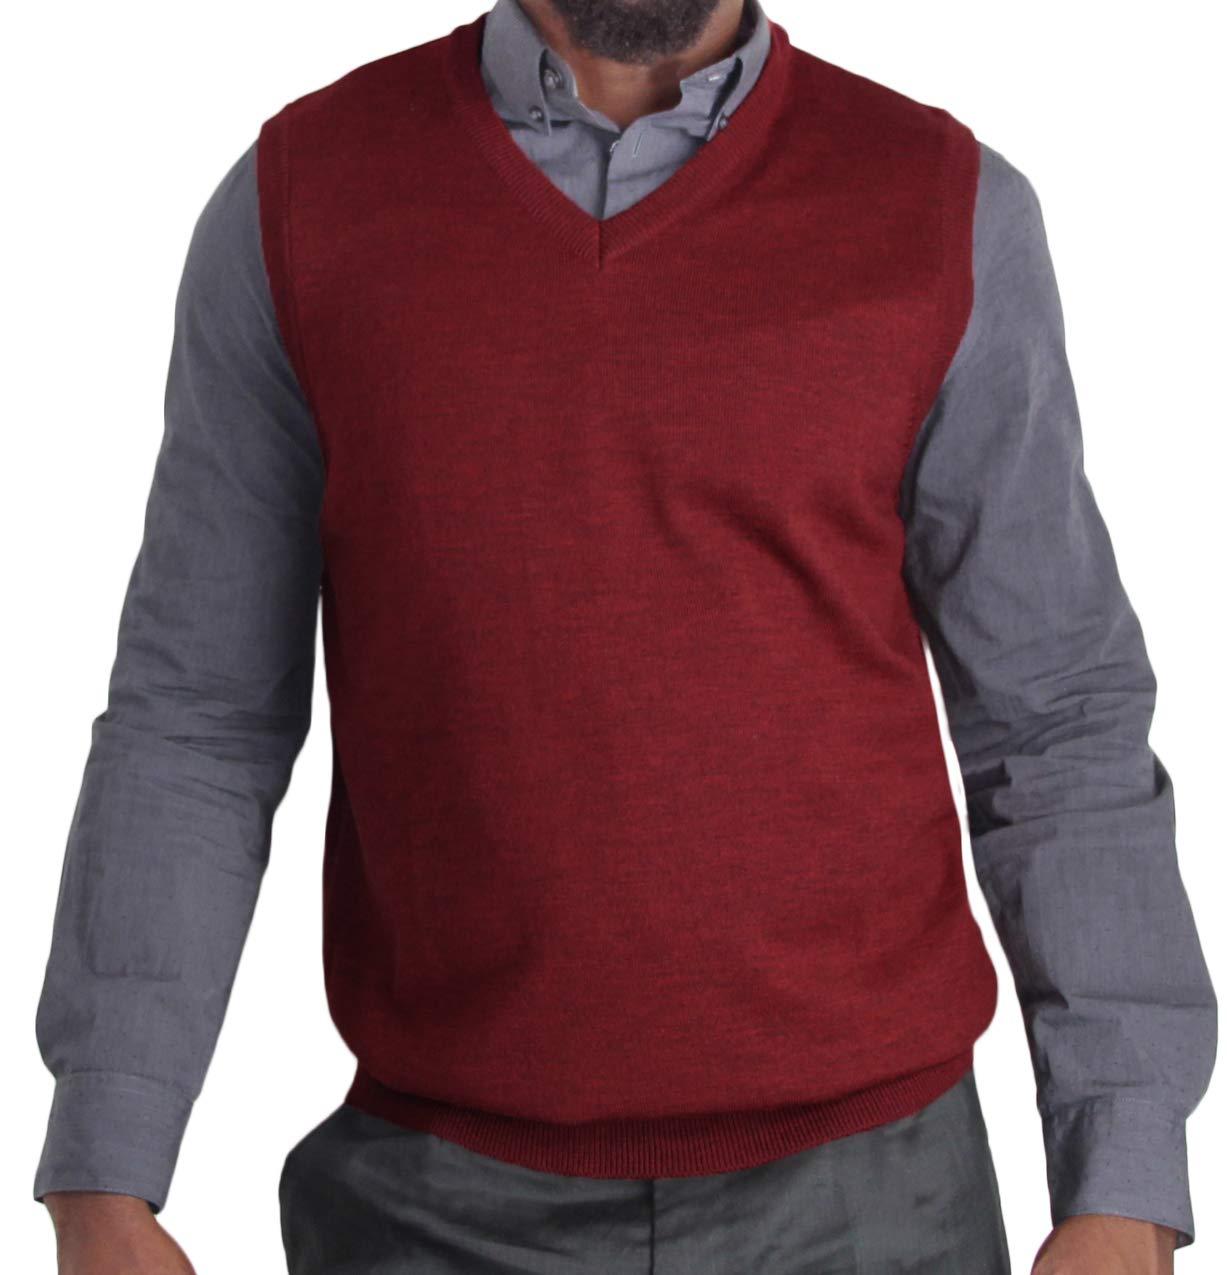 Blue Ocean Heather Sweater Vest-Medium by Blue Ocean